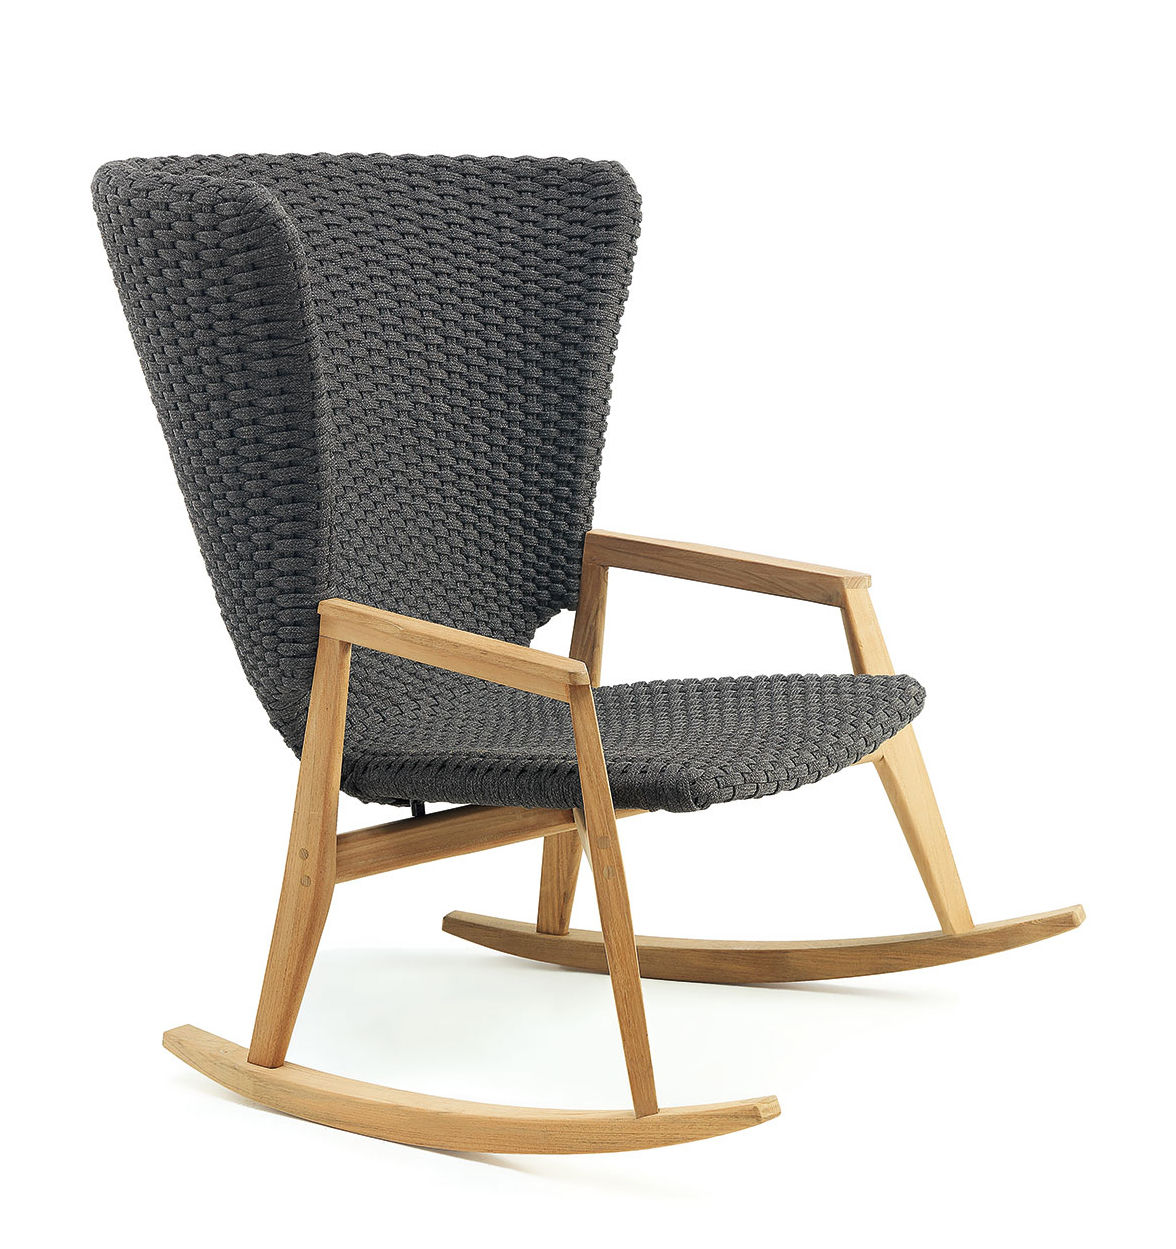 Möbel - Lounge Sessel - Knit Schaukelstuhl / Synthetikfaden - Ethimo - Lavagrau / Teakholz - Natürliches Teakholz, Synthetisches Seil